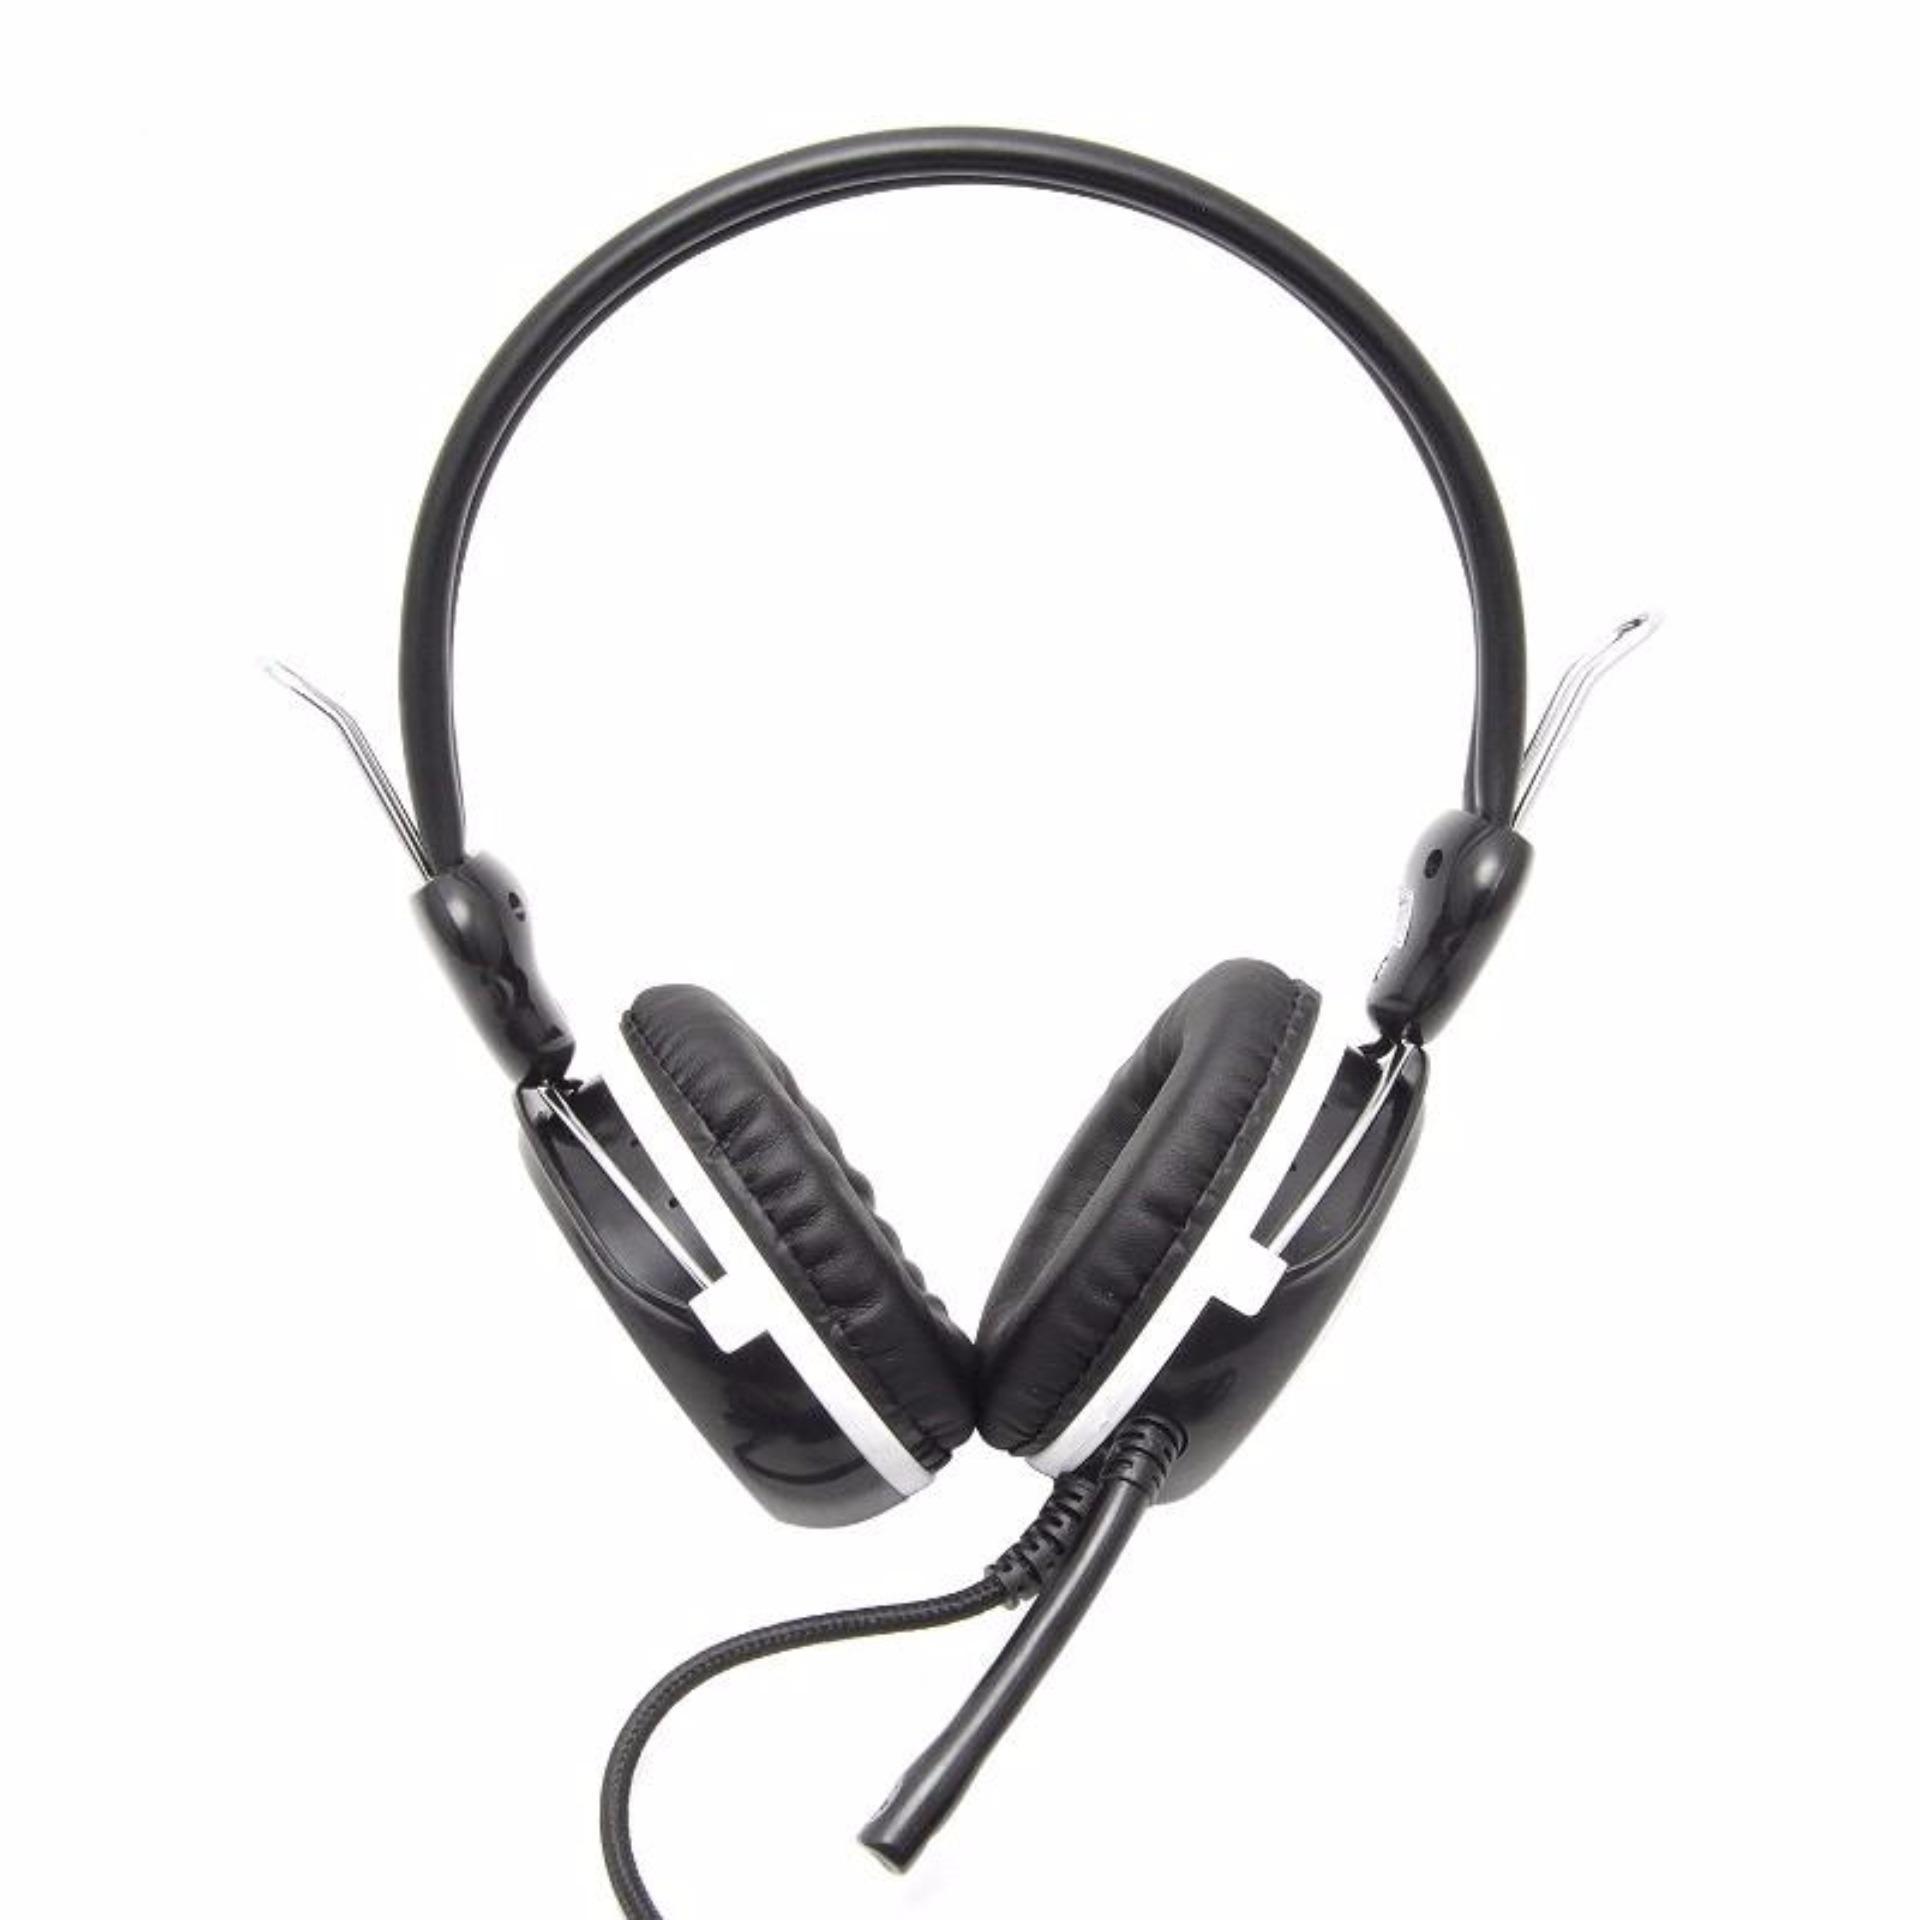 Keenion Headset Super Gaming Kos 888 Harga Terkini Dan Terlengkap 803 Headphone Original Blue 688